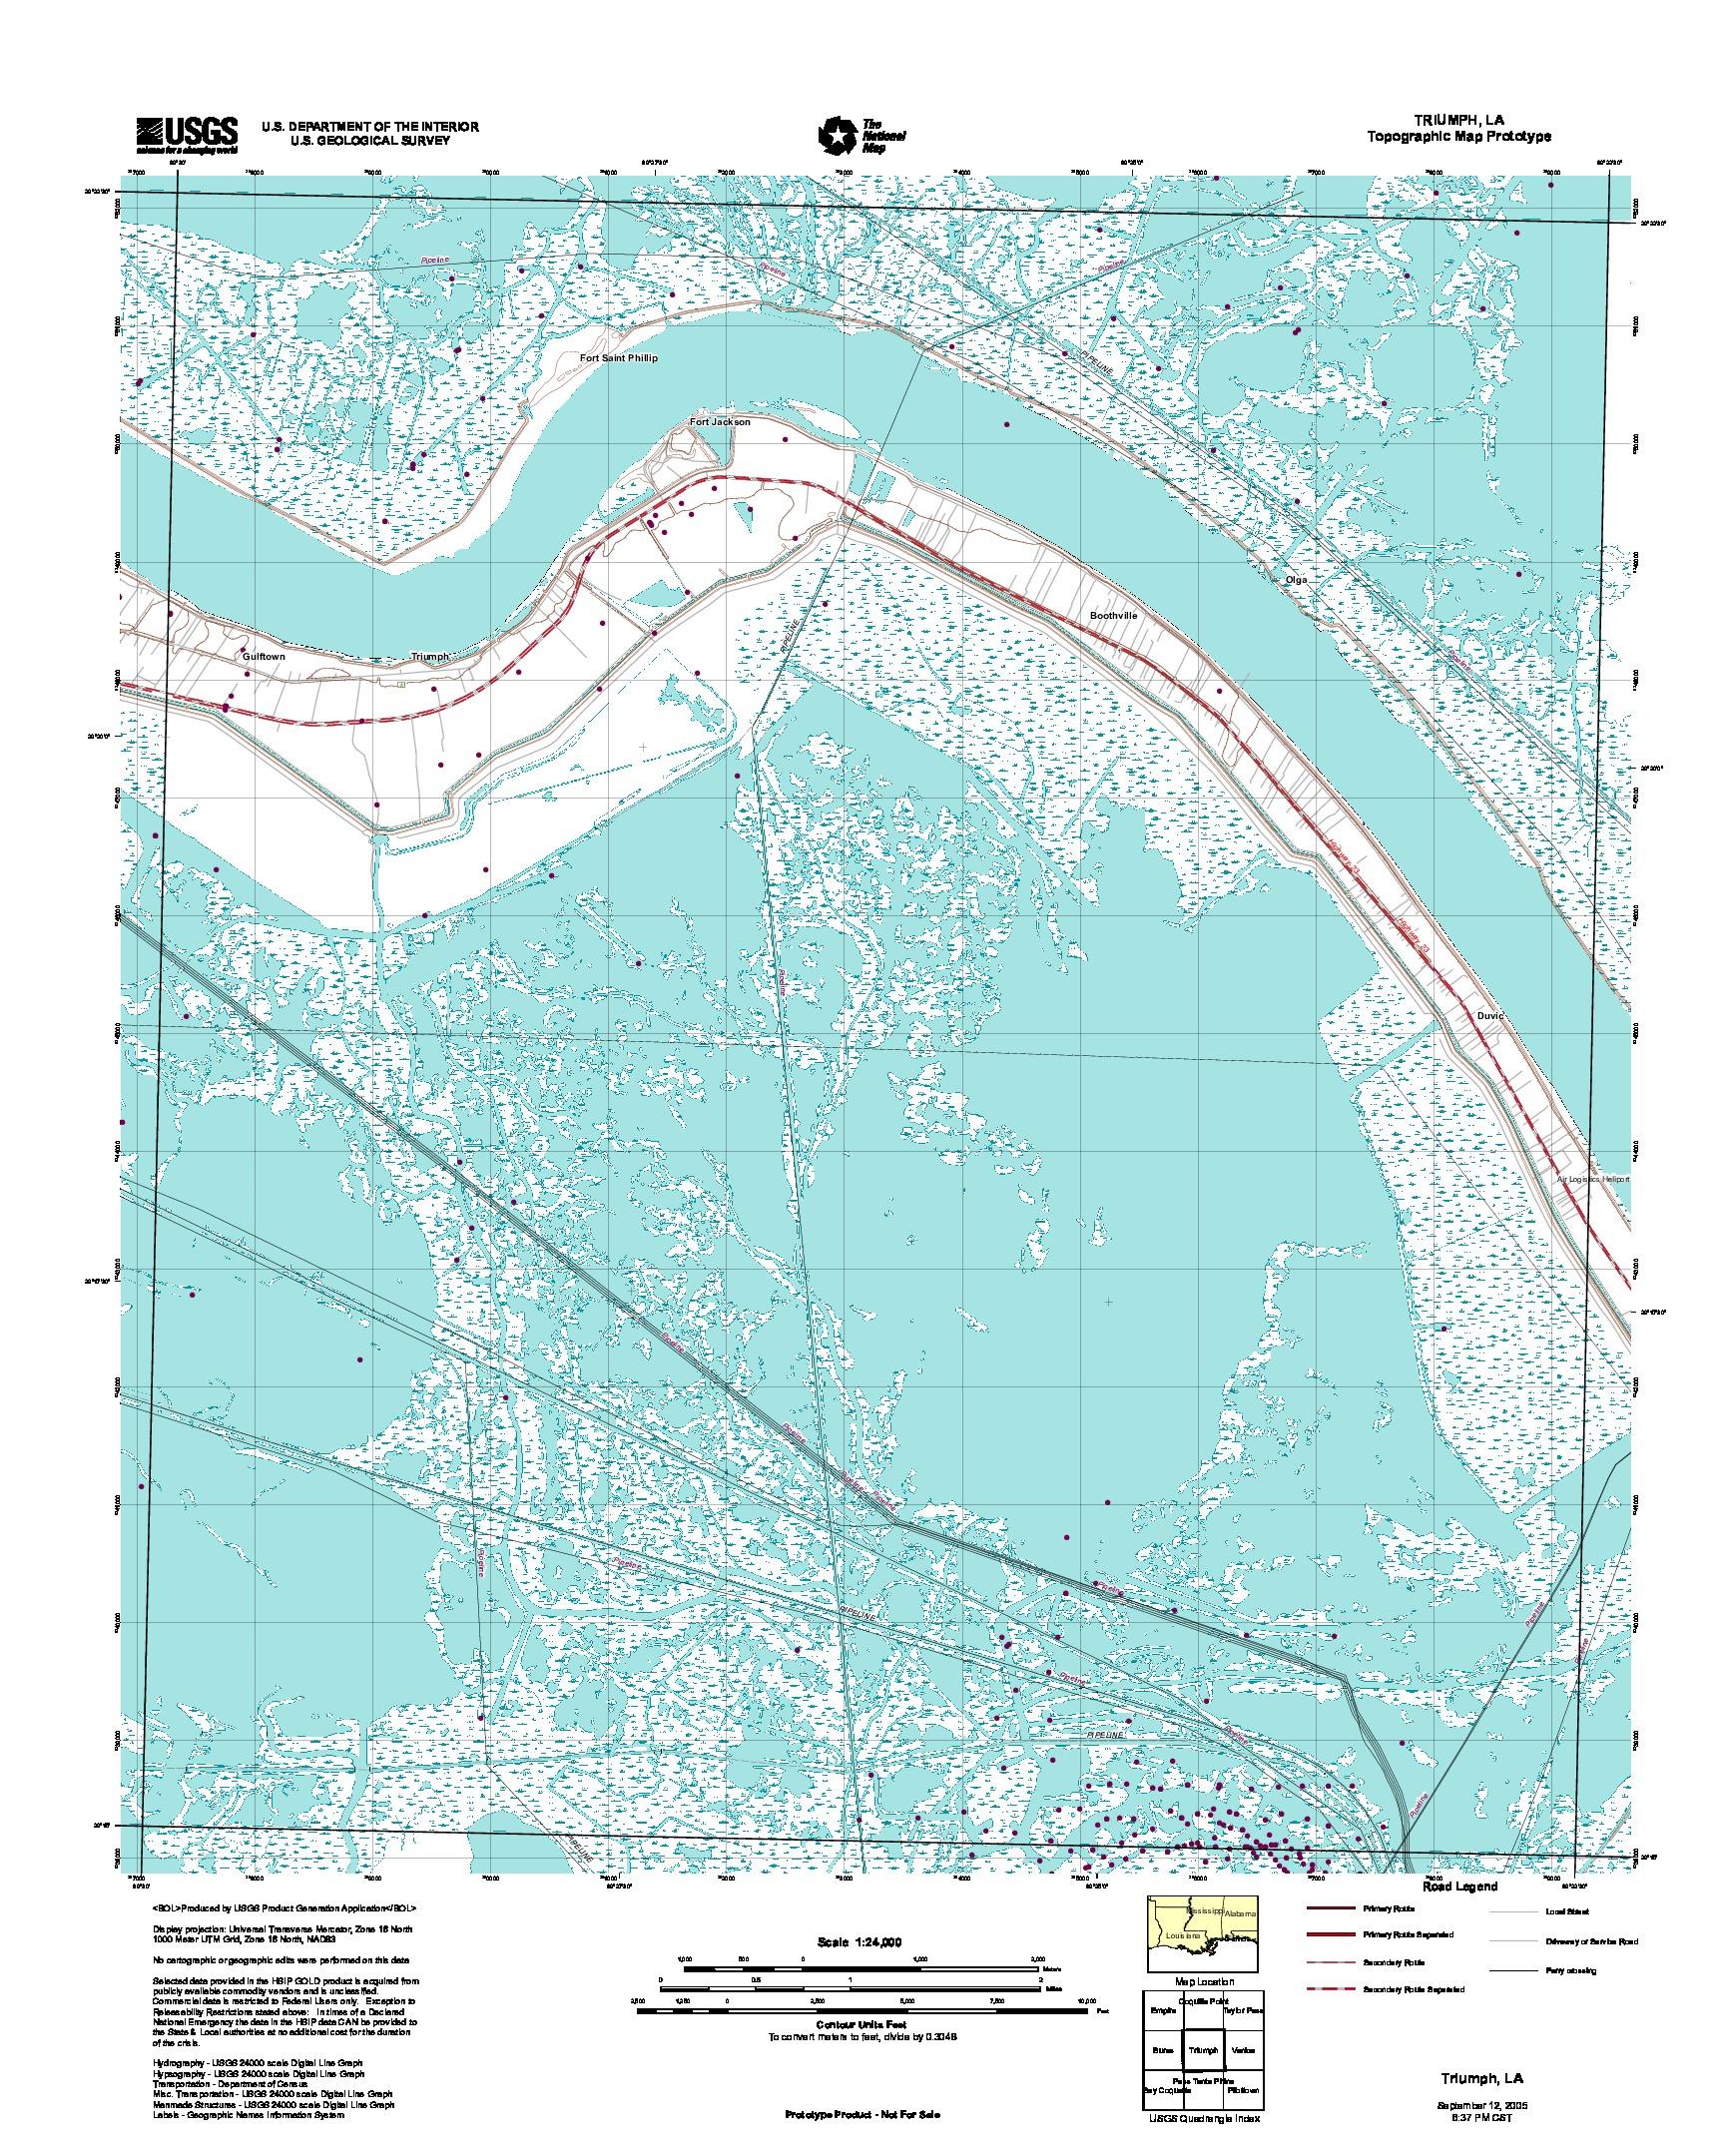 Triumph, Topographic Map Prototype, Louisiana, United States, September 12, 2005